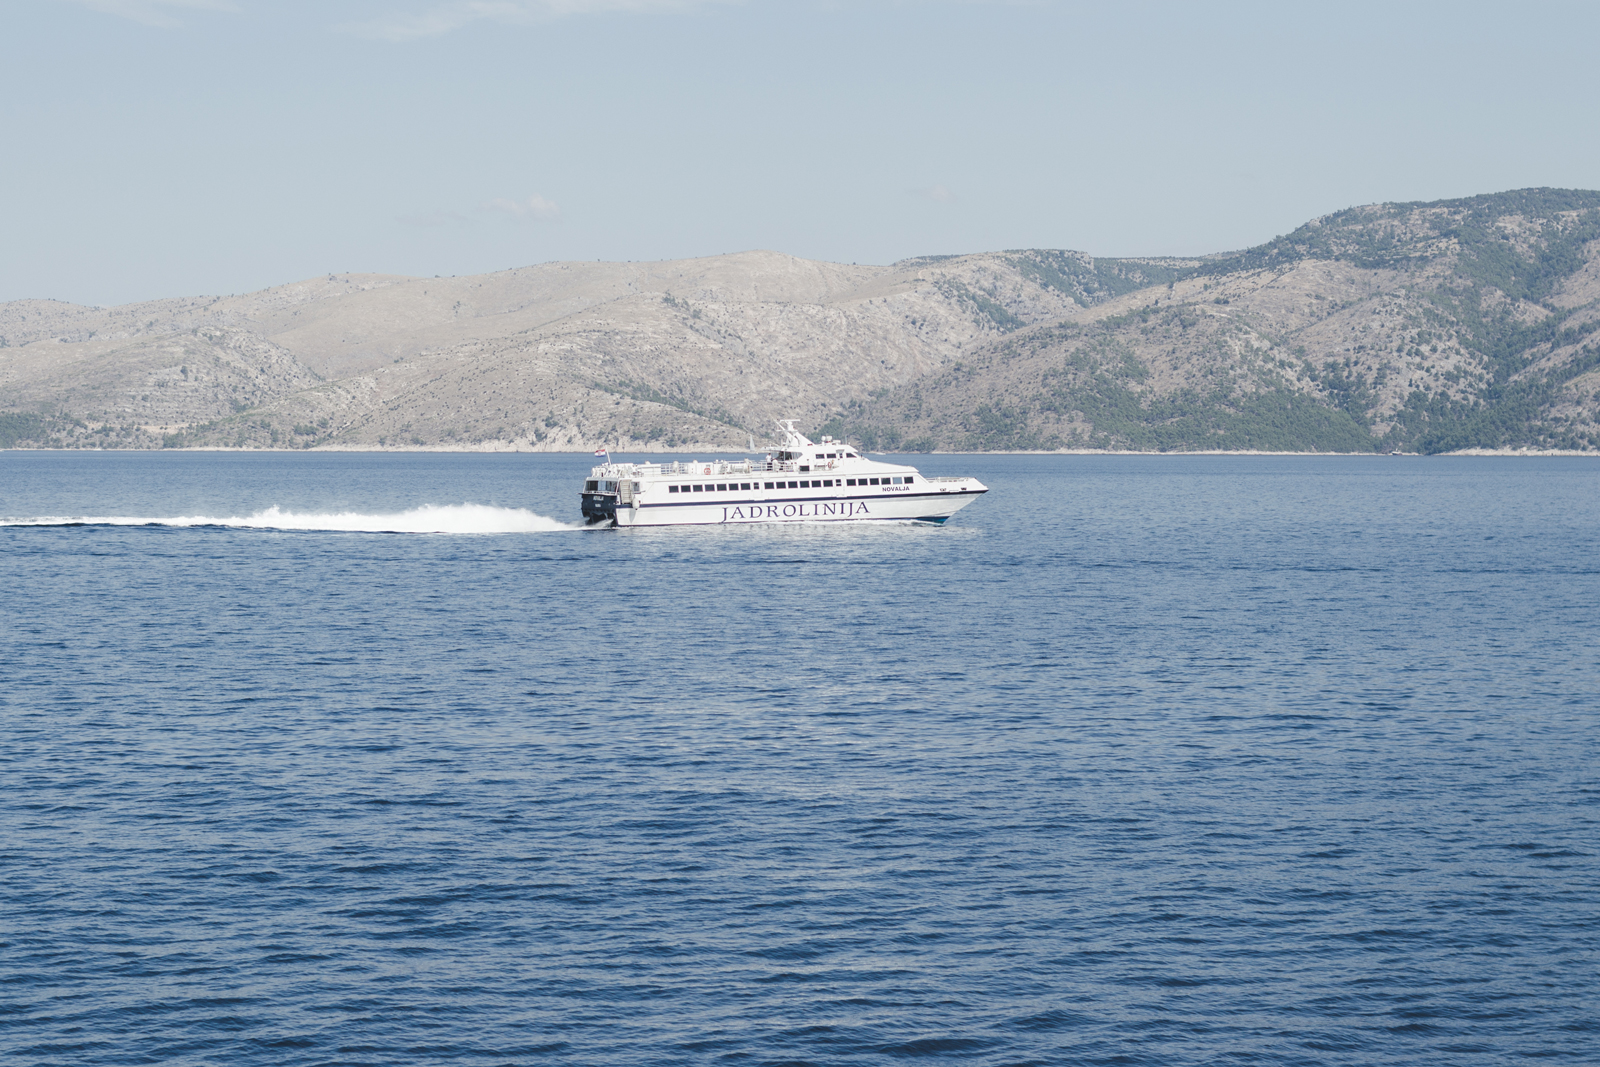 Jardolinija ferry to Hvar - from travel blog http://Epepa.eu